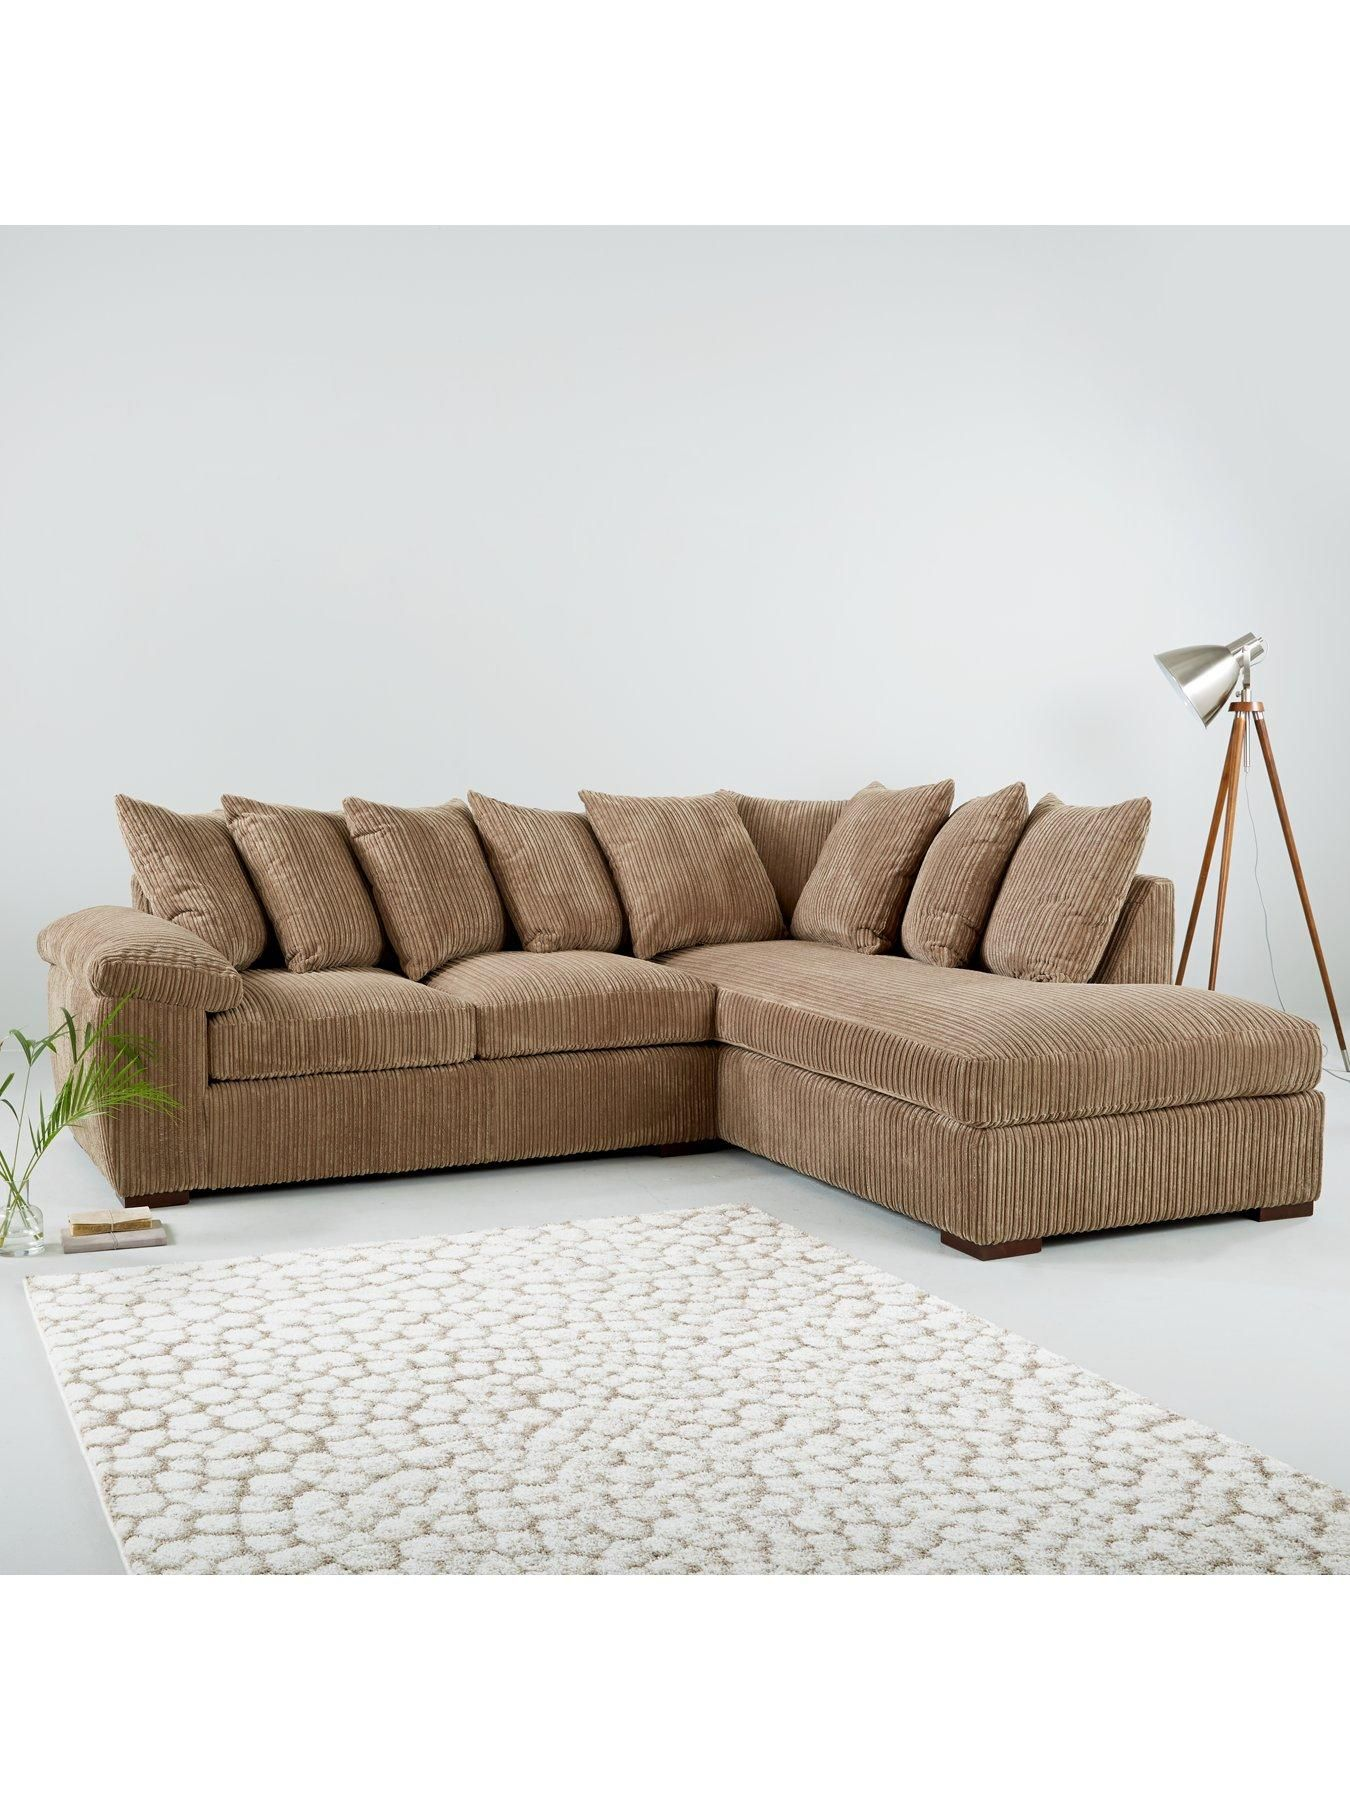 Amalfi Right Hand Scatter Back Fabric Corner Chaise Sofa Chaise Sofa Chaise Sofa